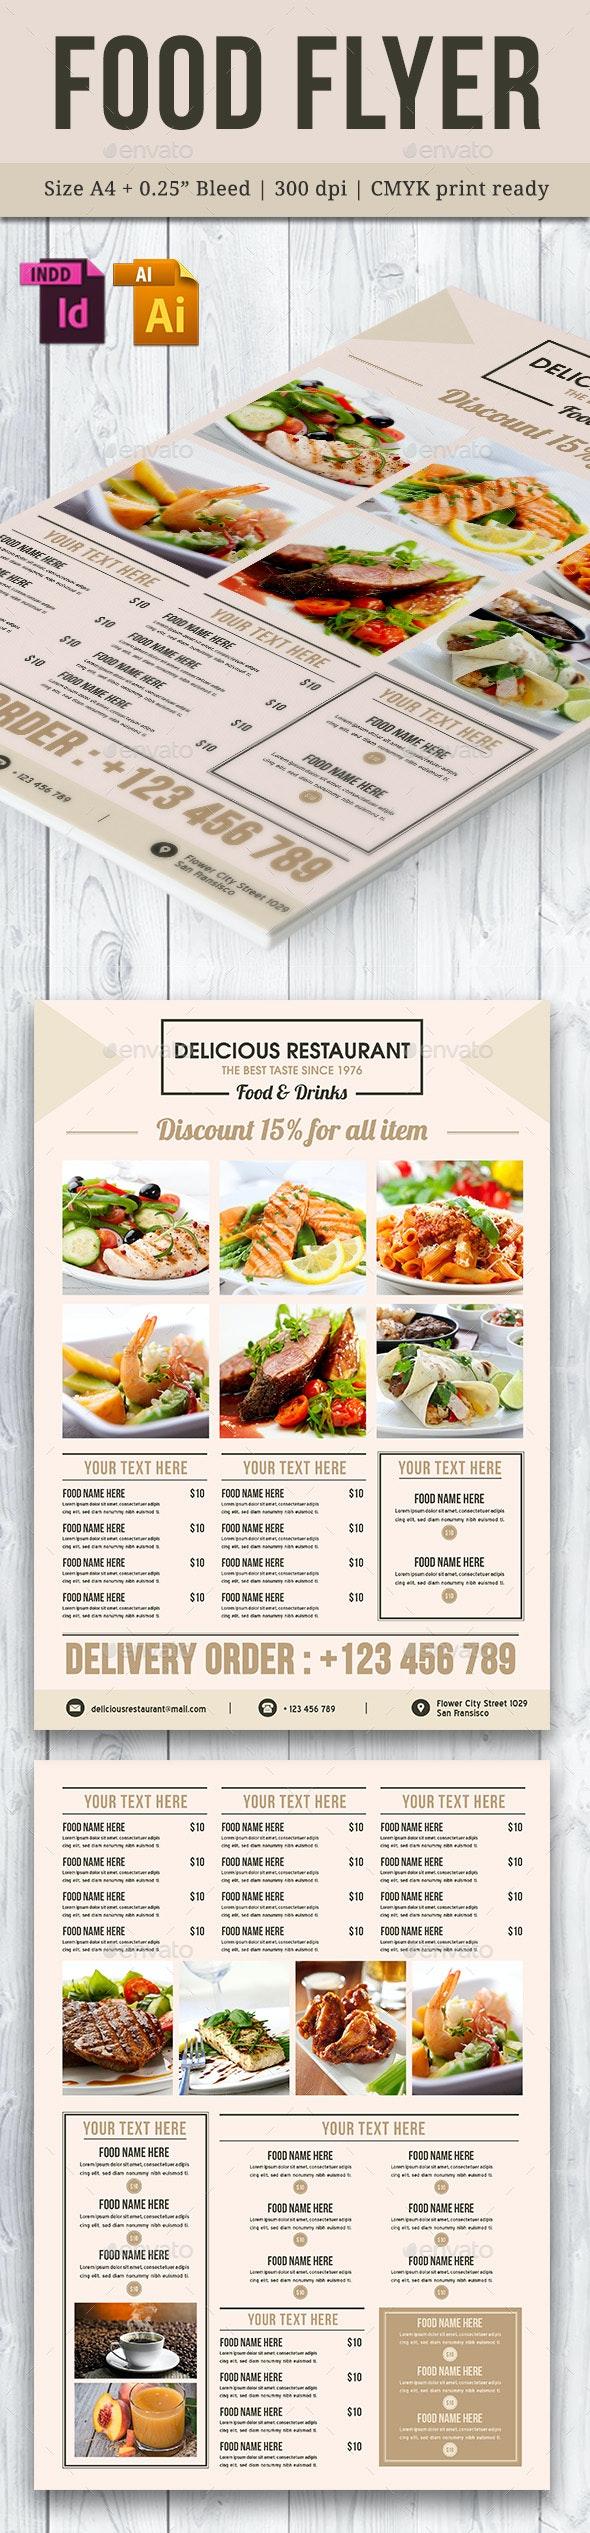 Food Flyer Template Vol. 10 - Restaurant Flyers